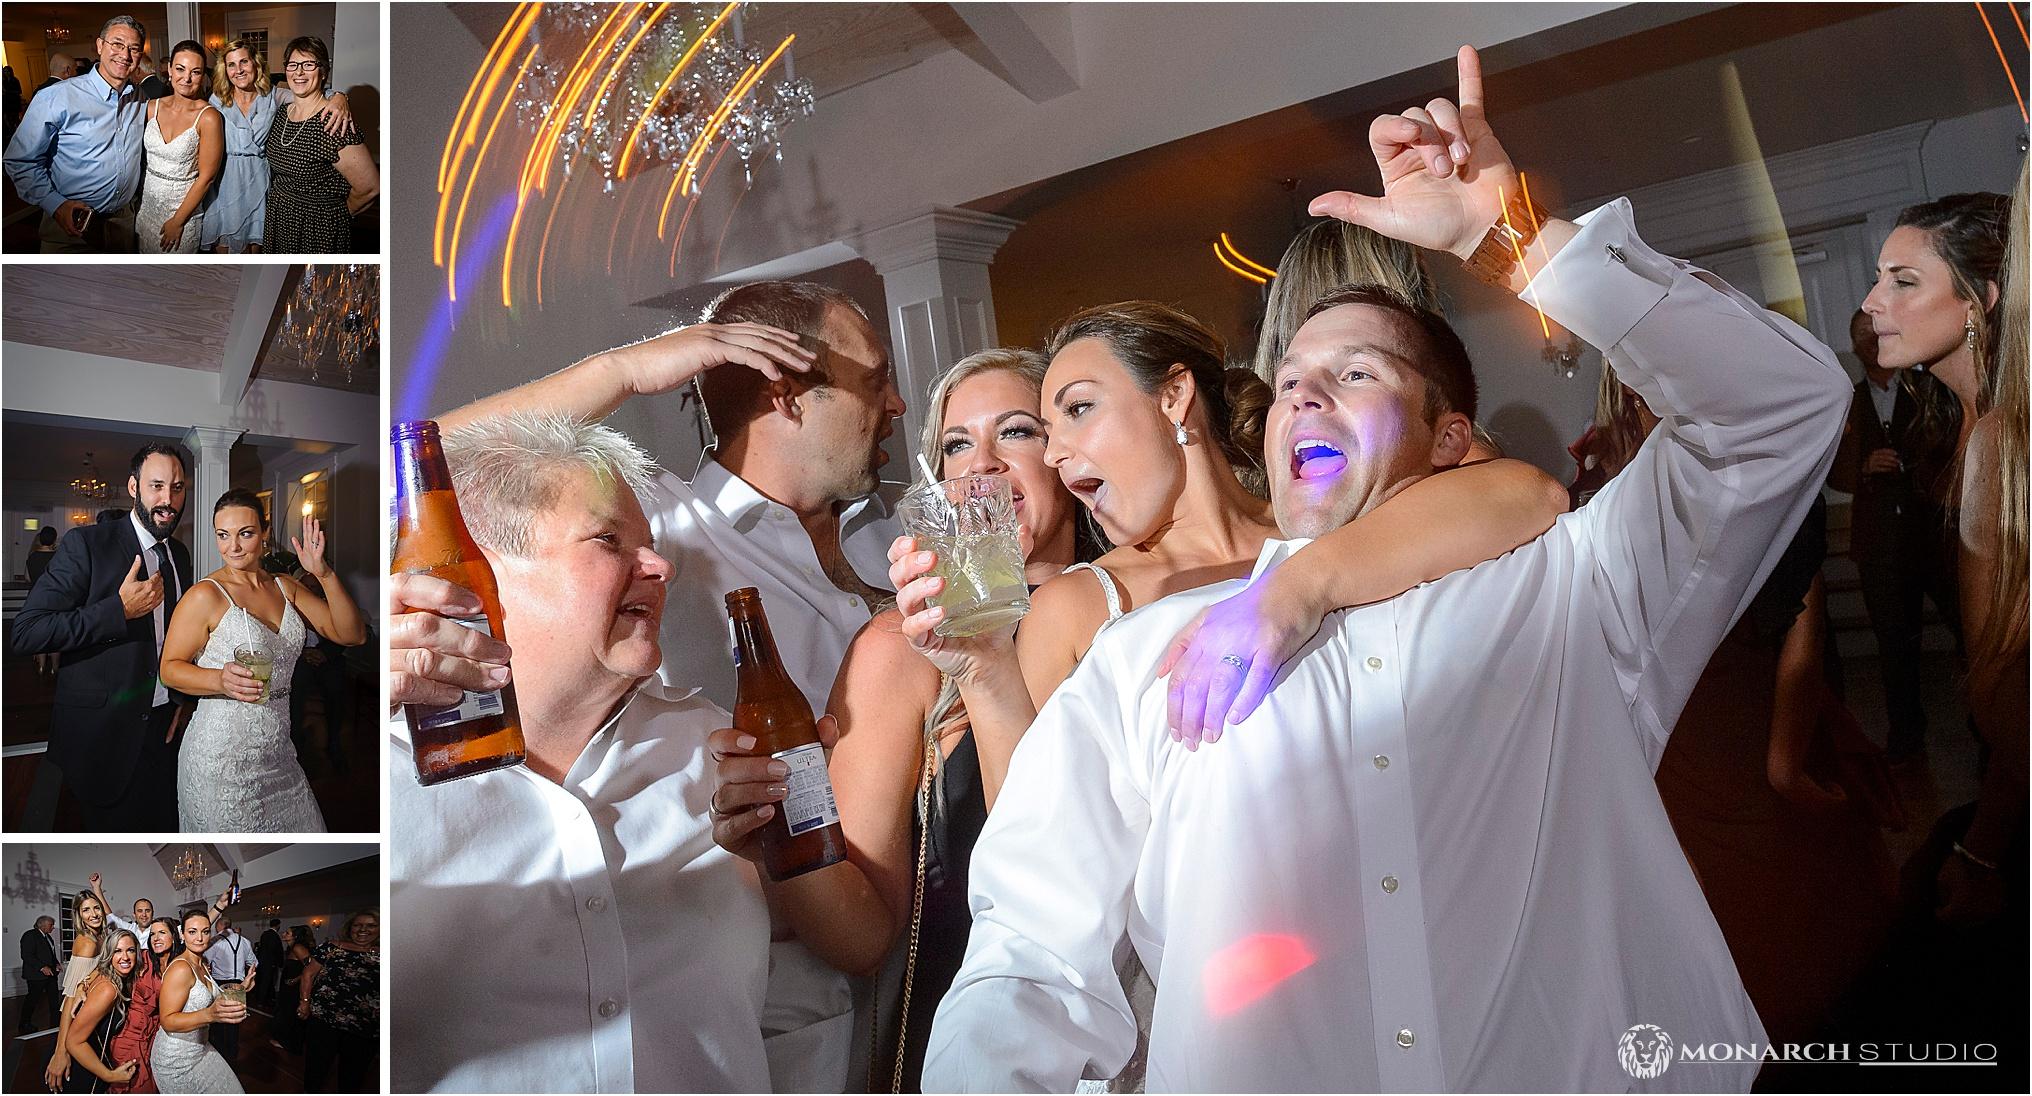 119-whiteroom-wedding-photographer-2019-05-22_0101.jpg